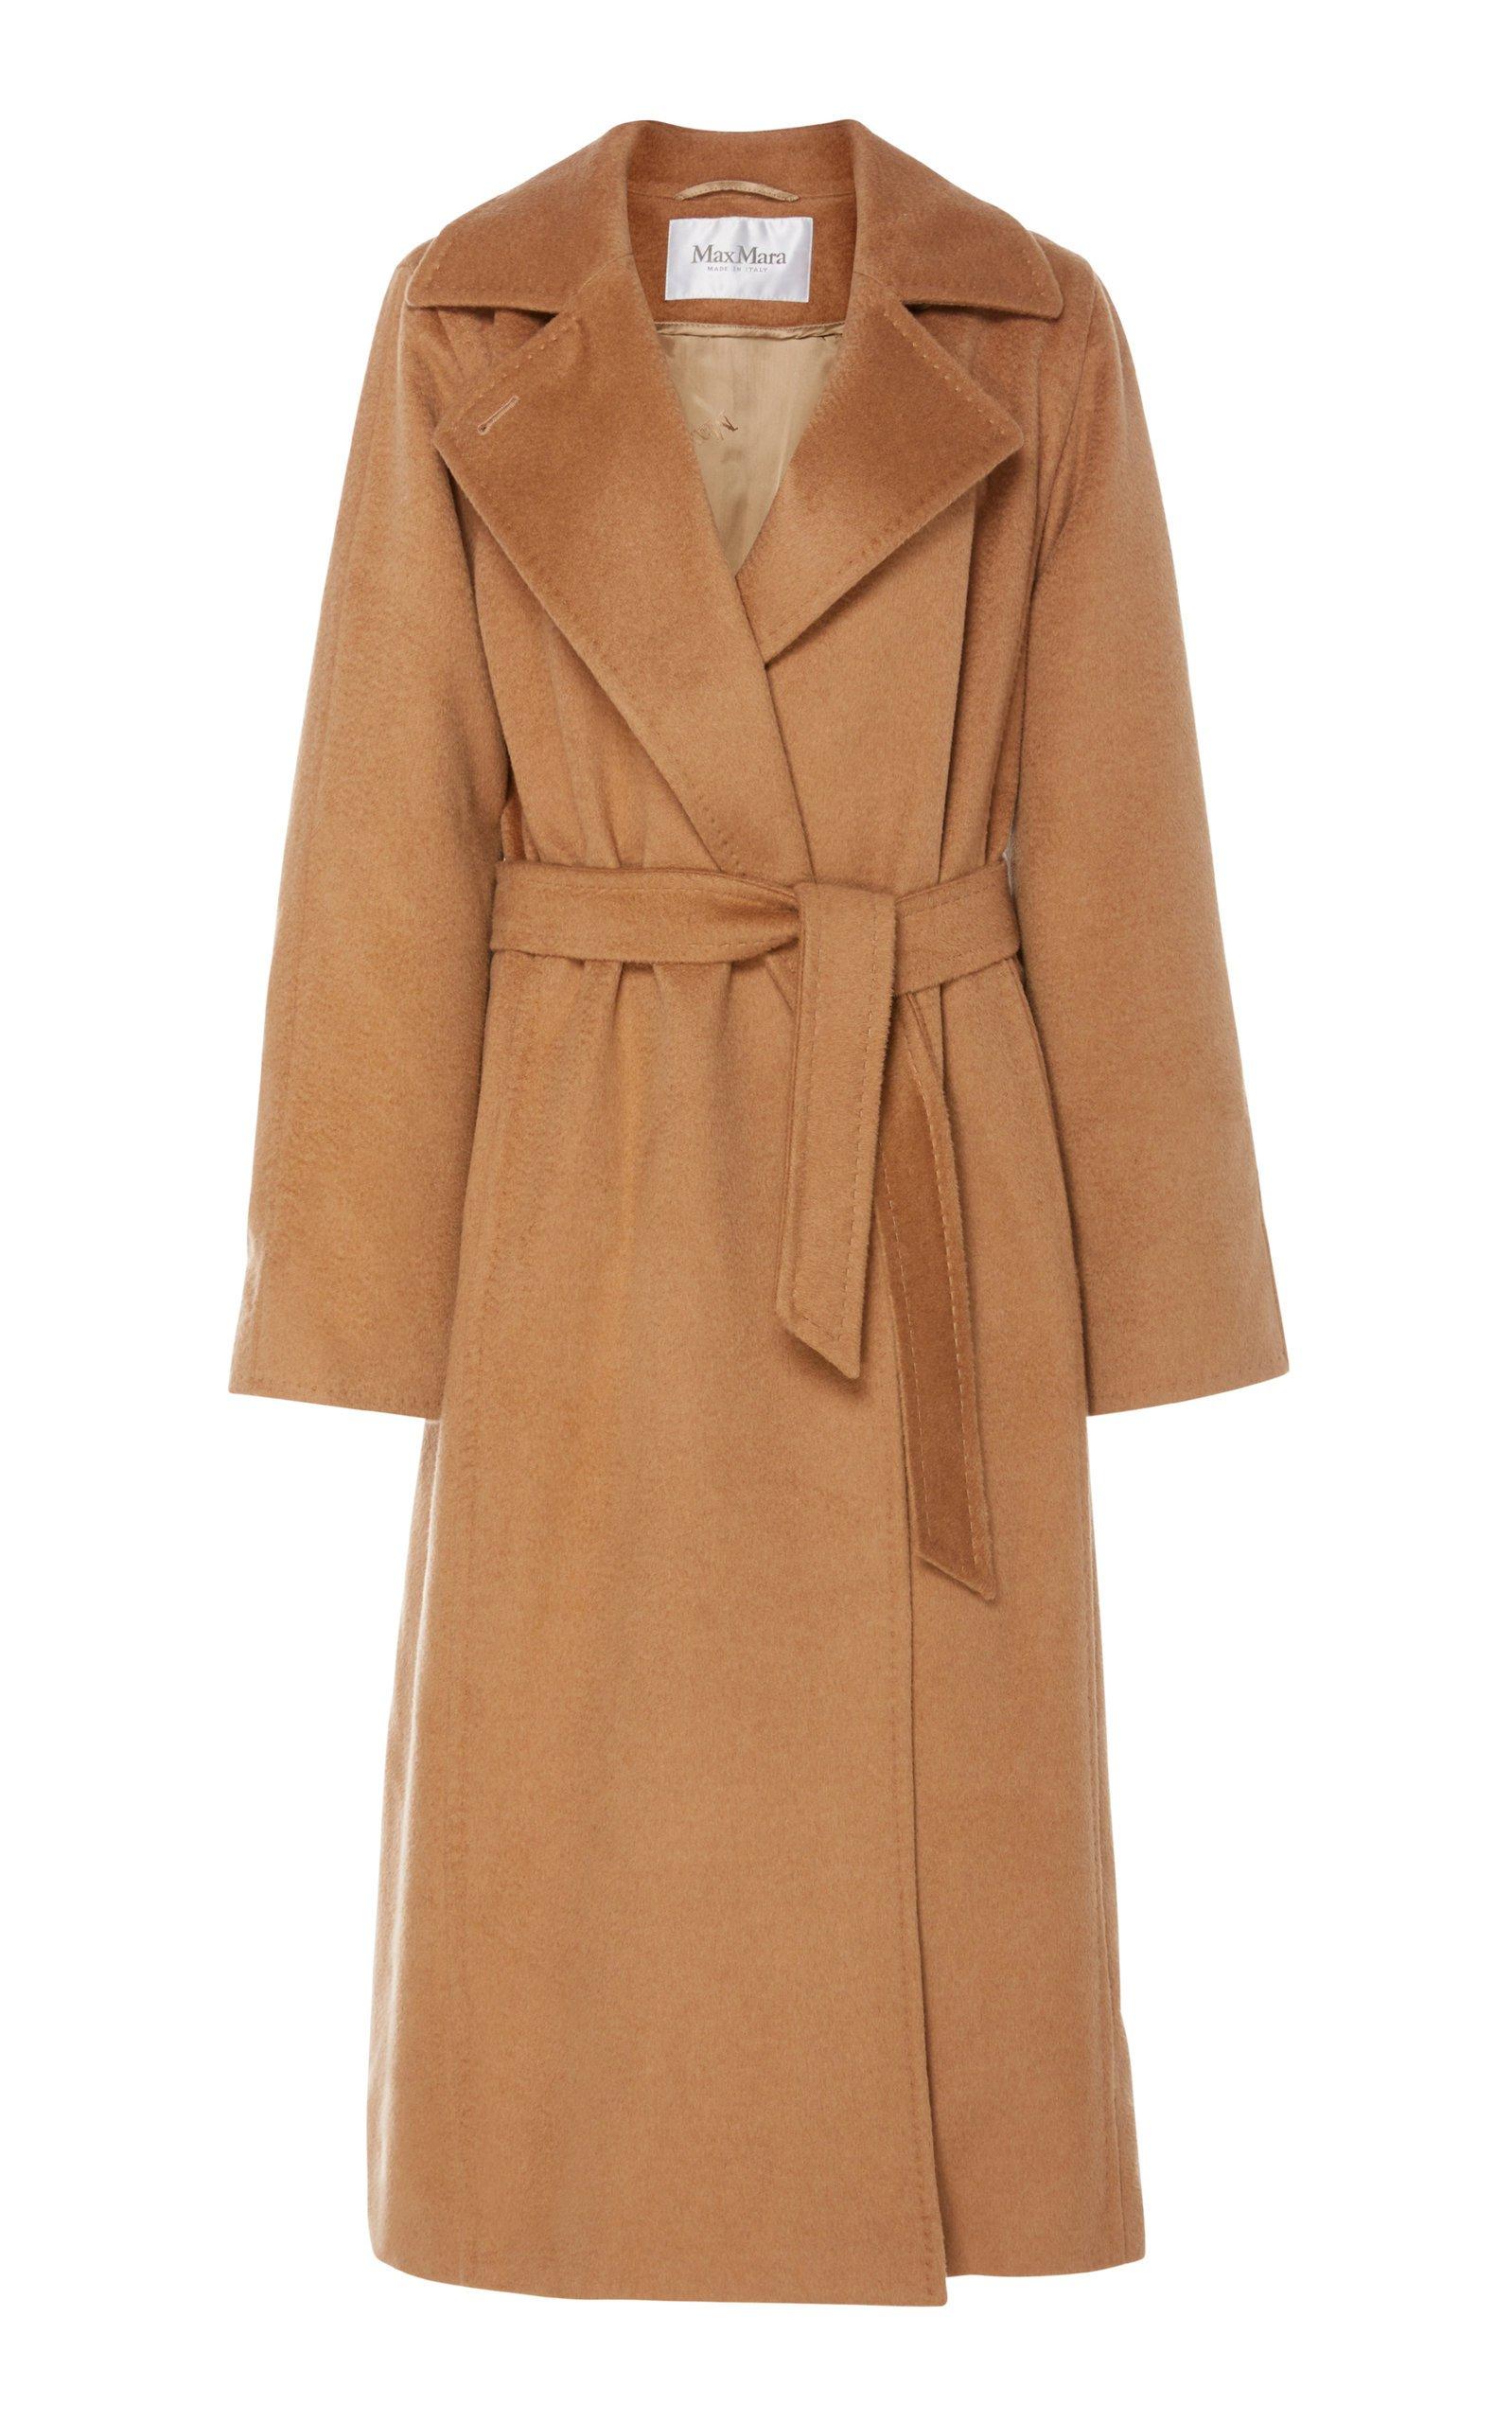 Manuela Belted Camel Hair Coat by Max Mara | Moda Operandi